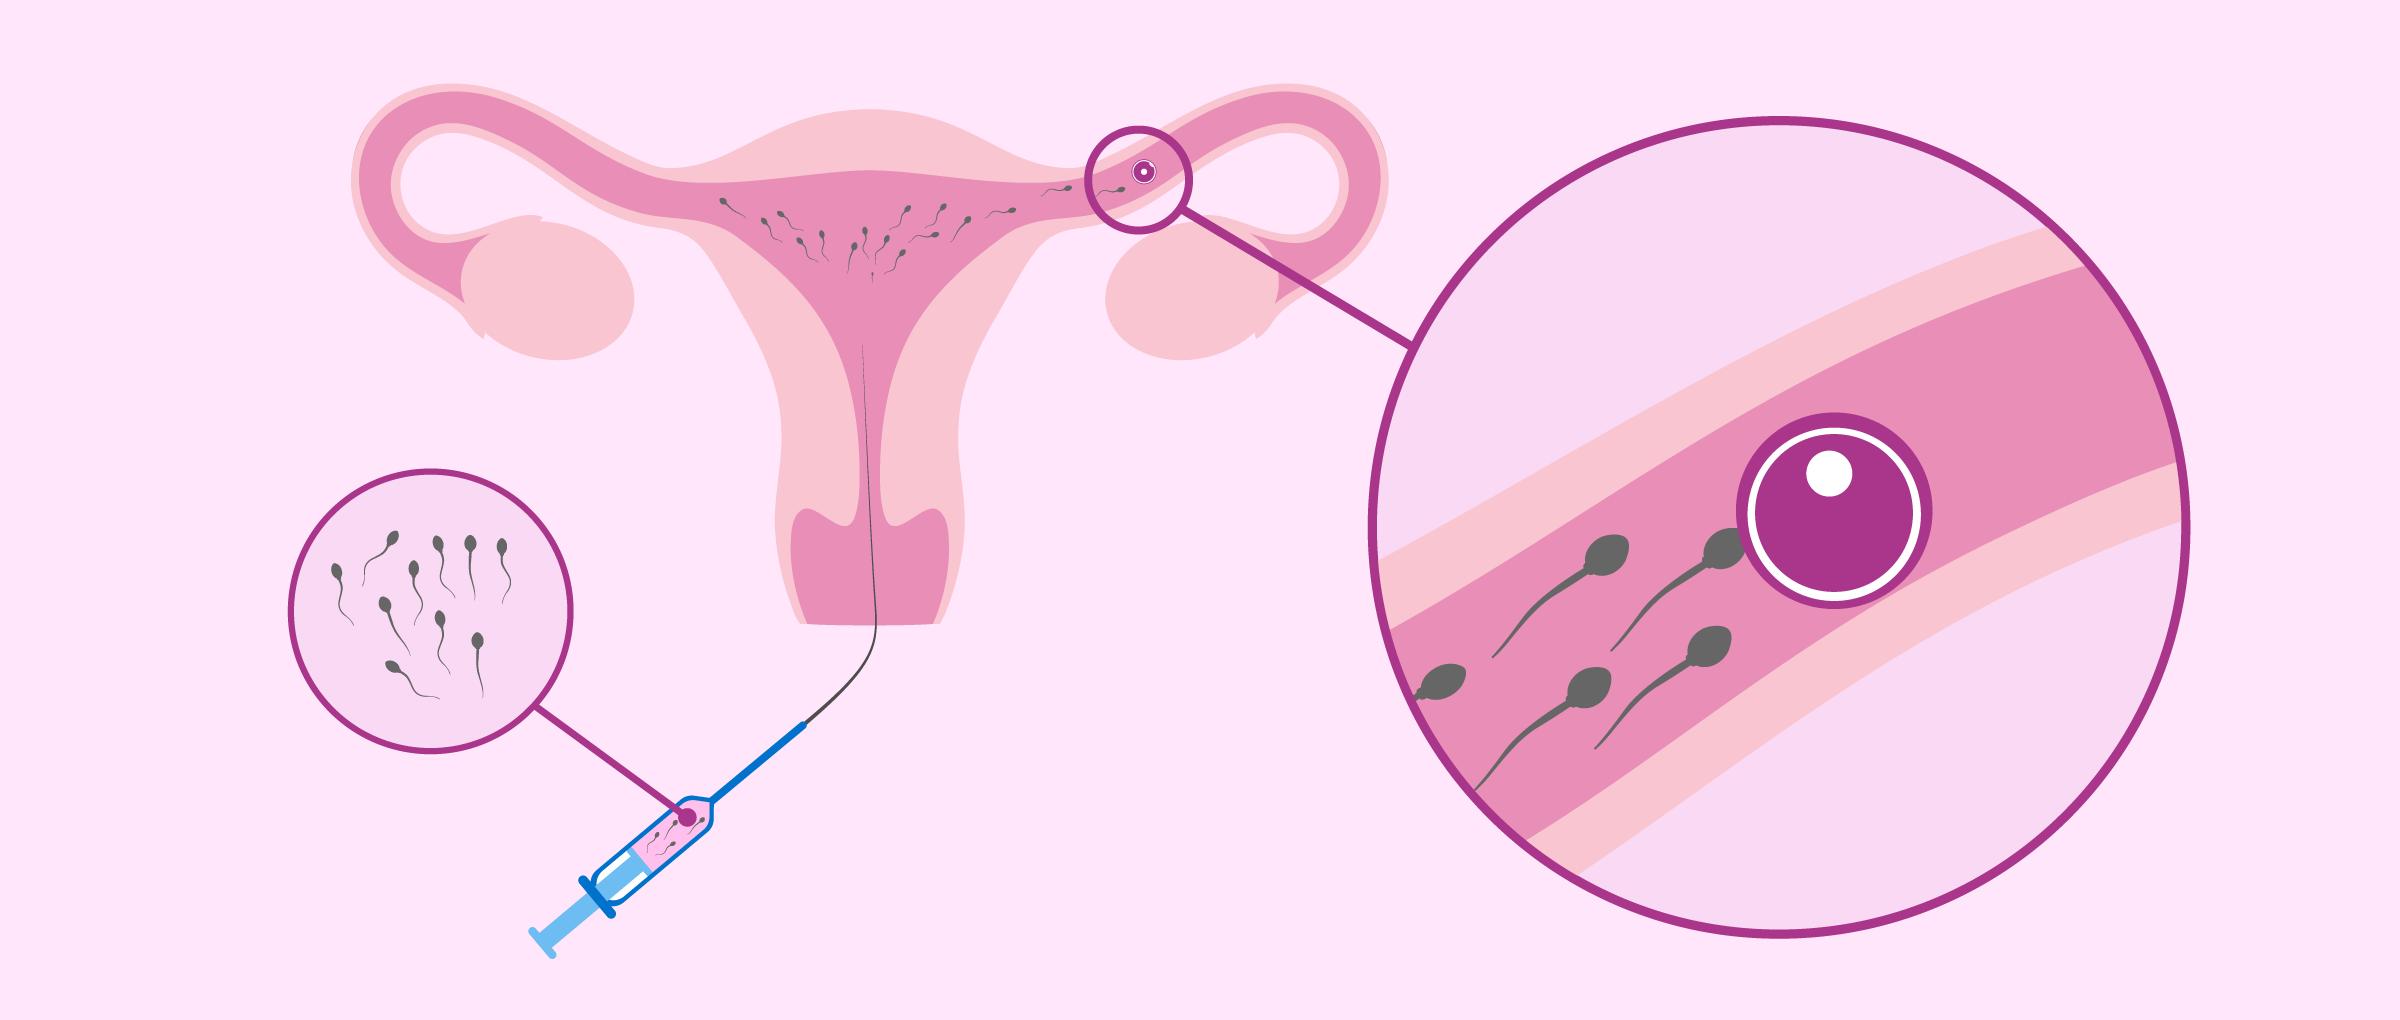 The Intrauterine Insemination (IUI) Process Step by Step